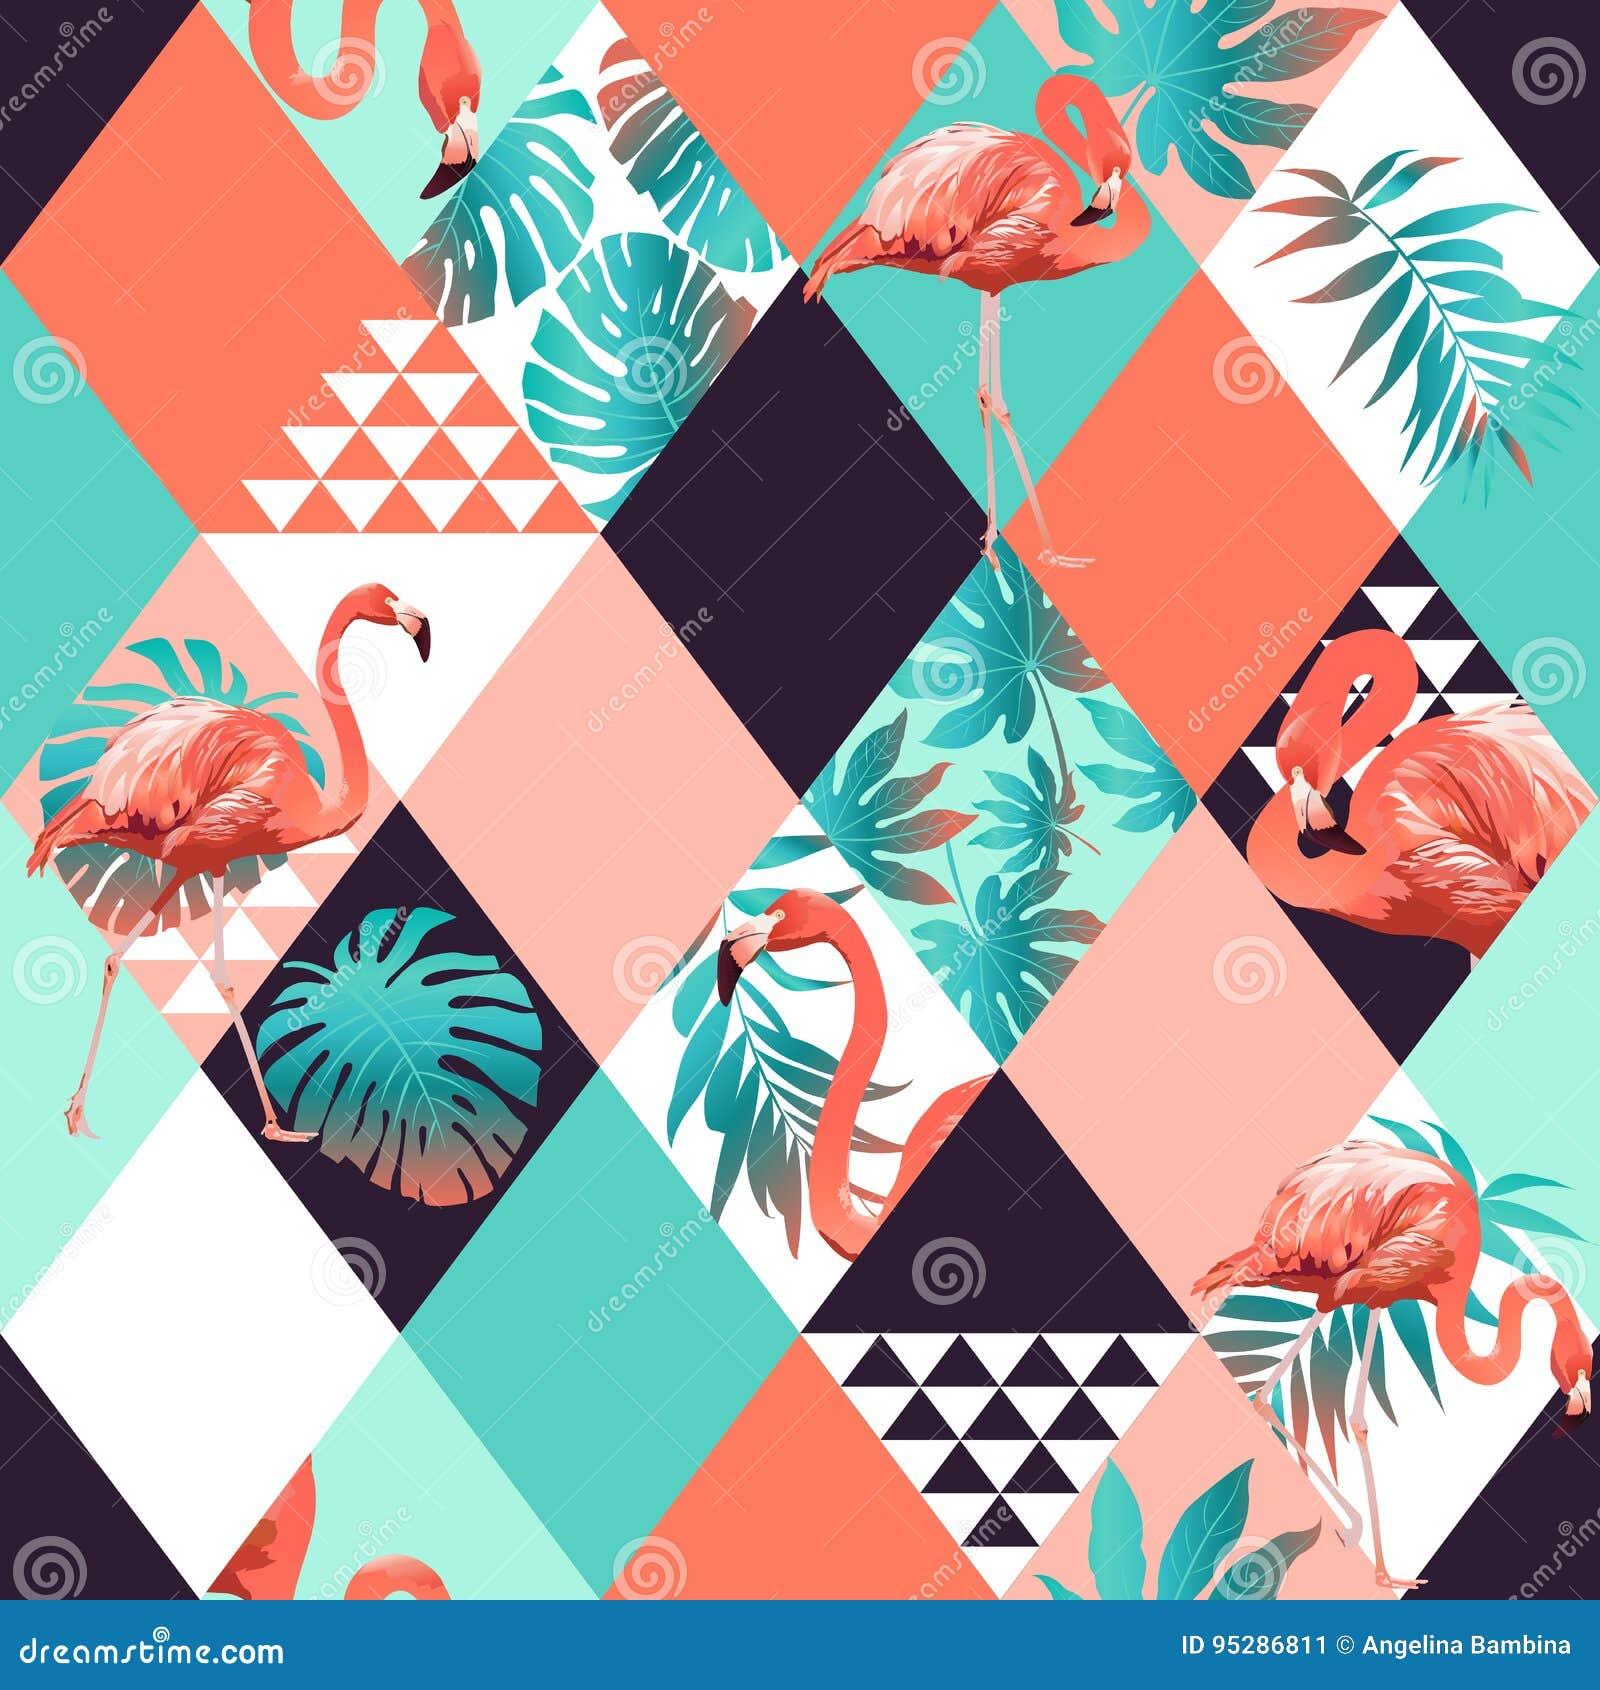 Trendy Wallpaper: Exotic Beach Trendy Seamless Pattern, Patchwork